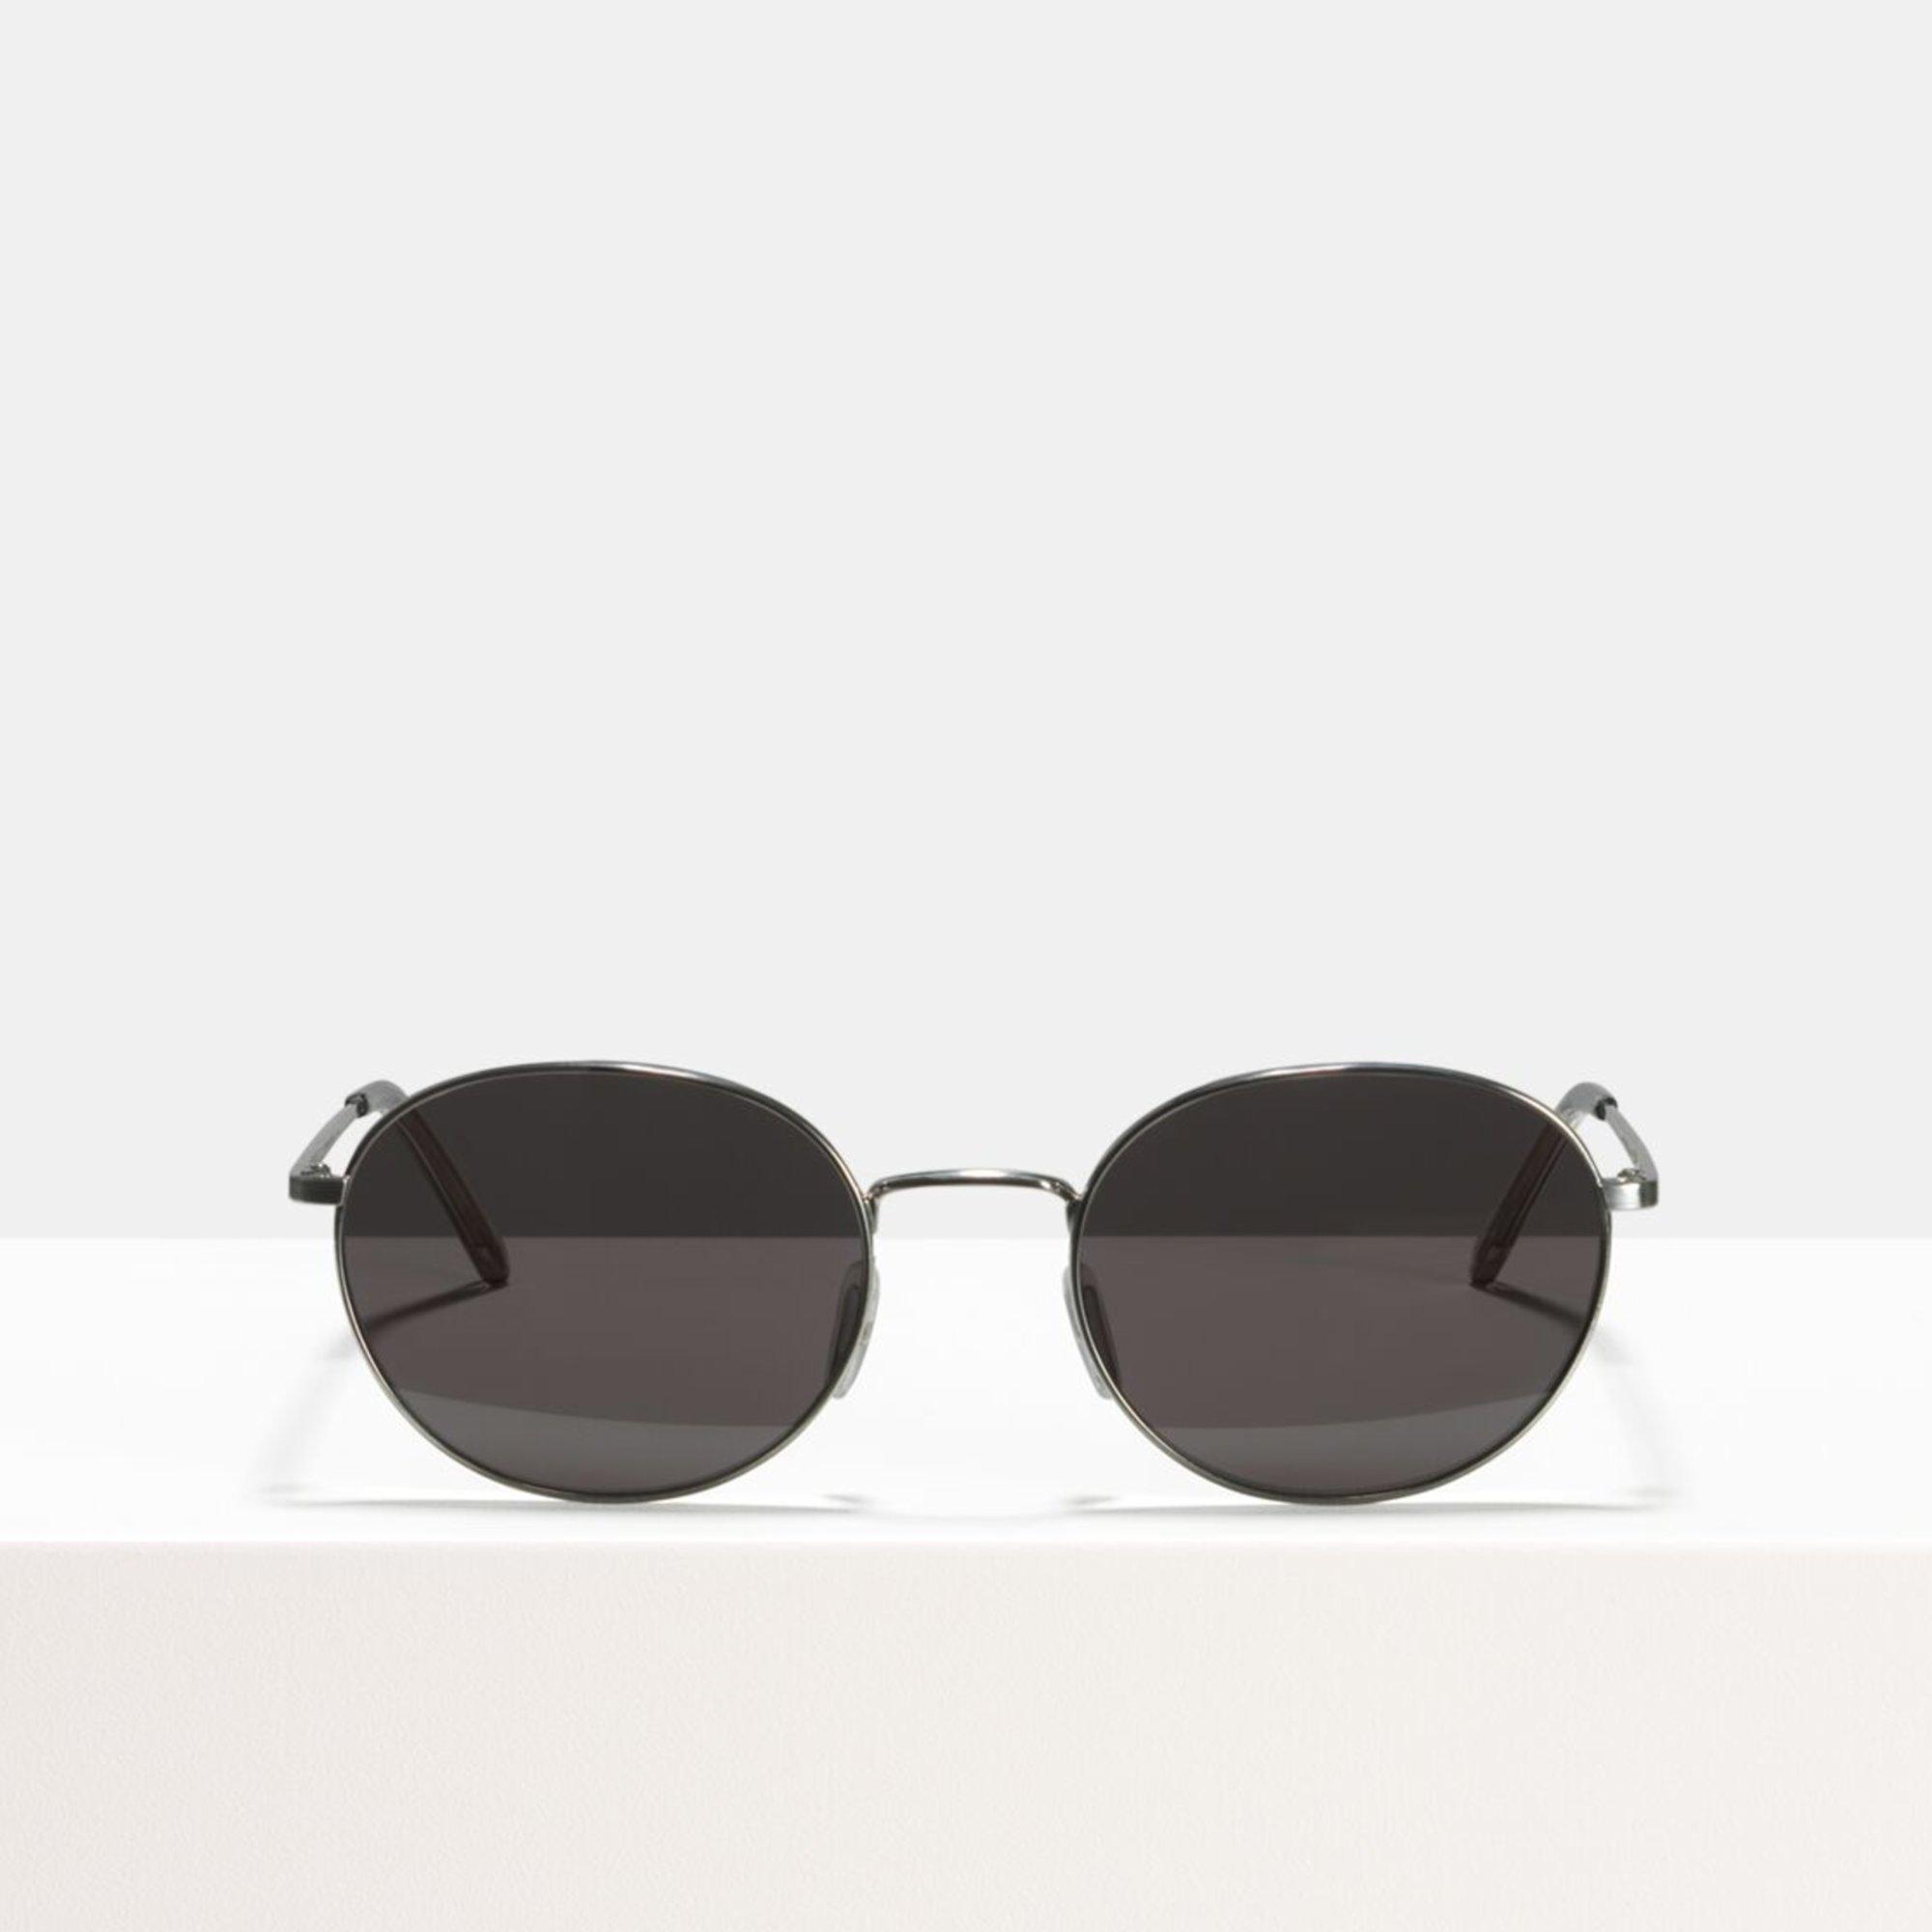 Ace & Tate Sunglasses |  metal in Silver